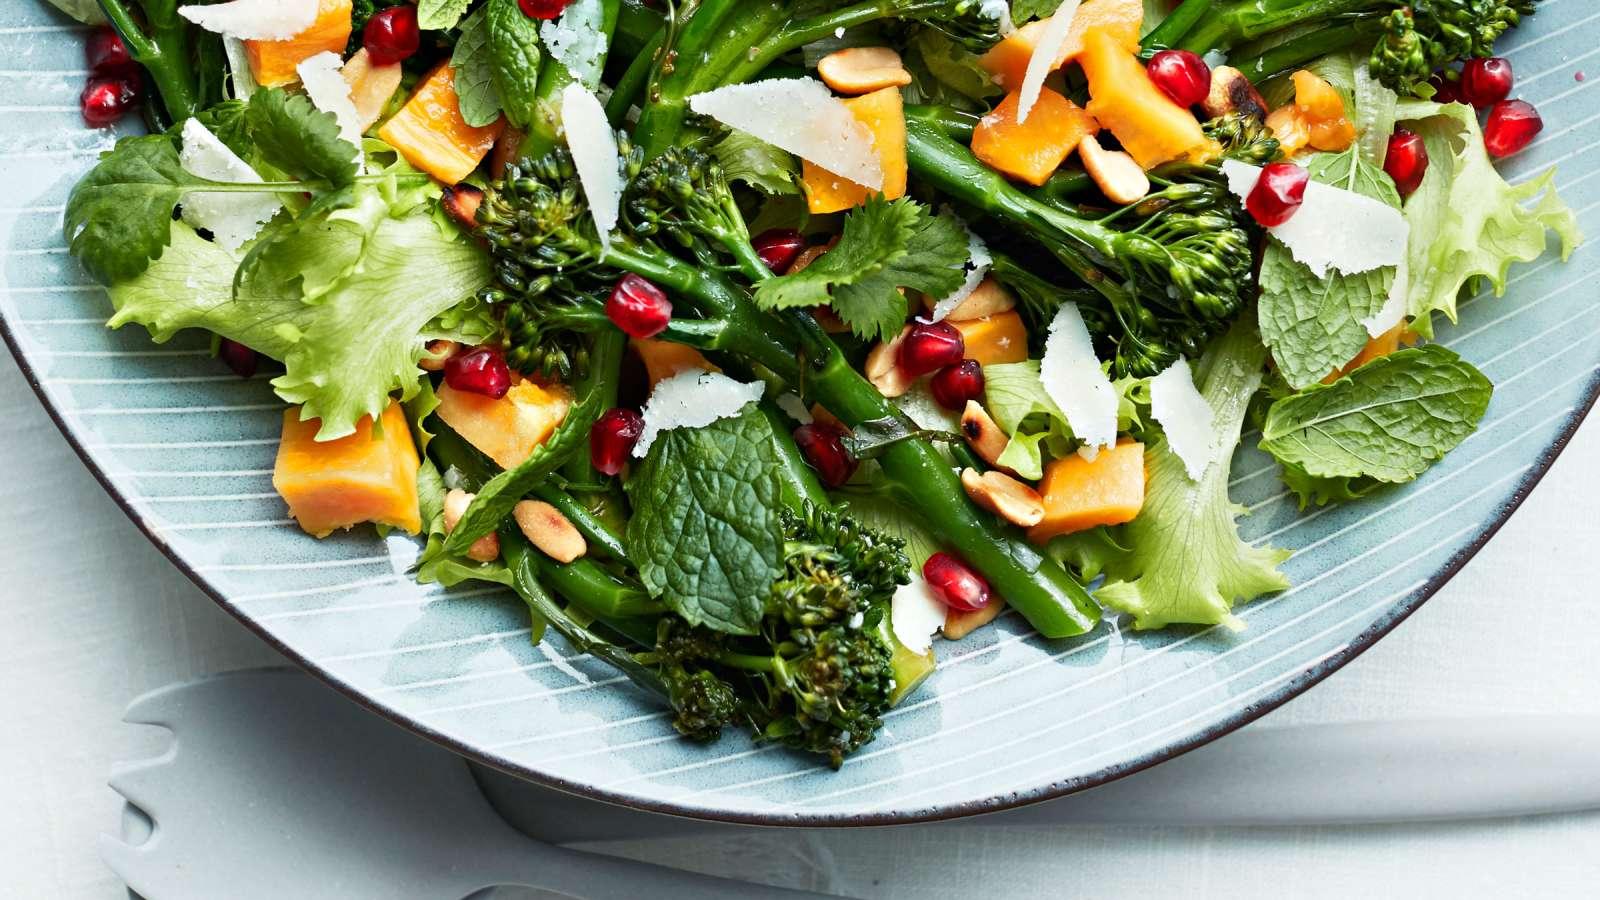 Broccolini Valmistus